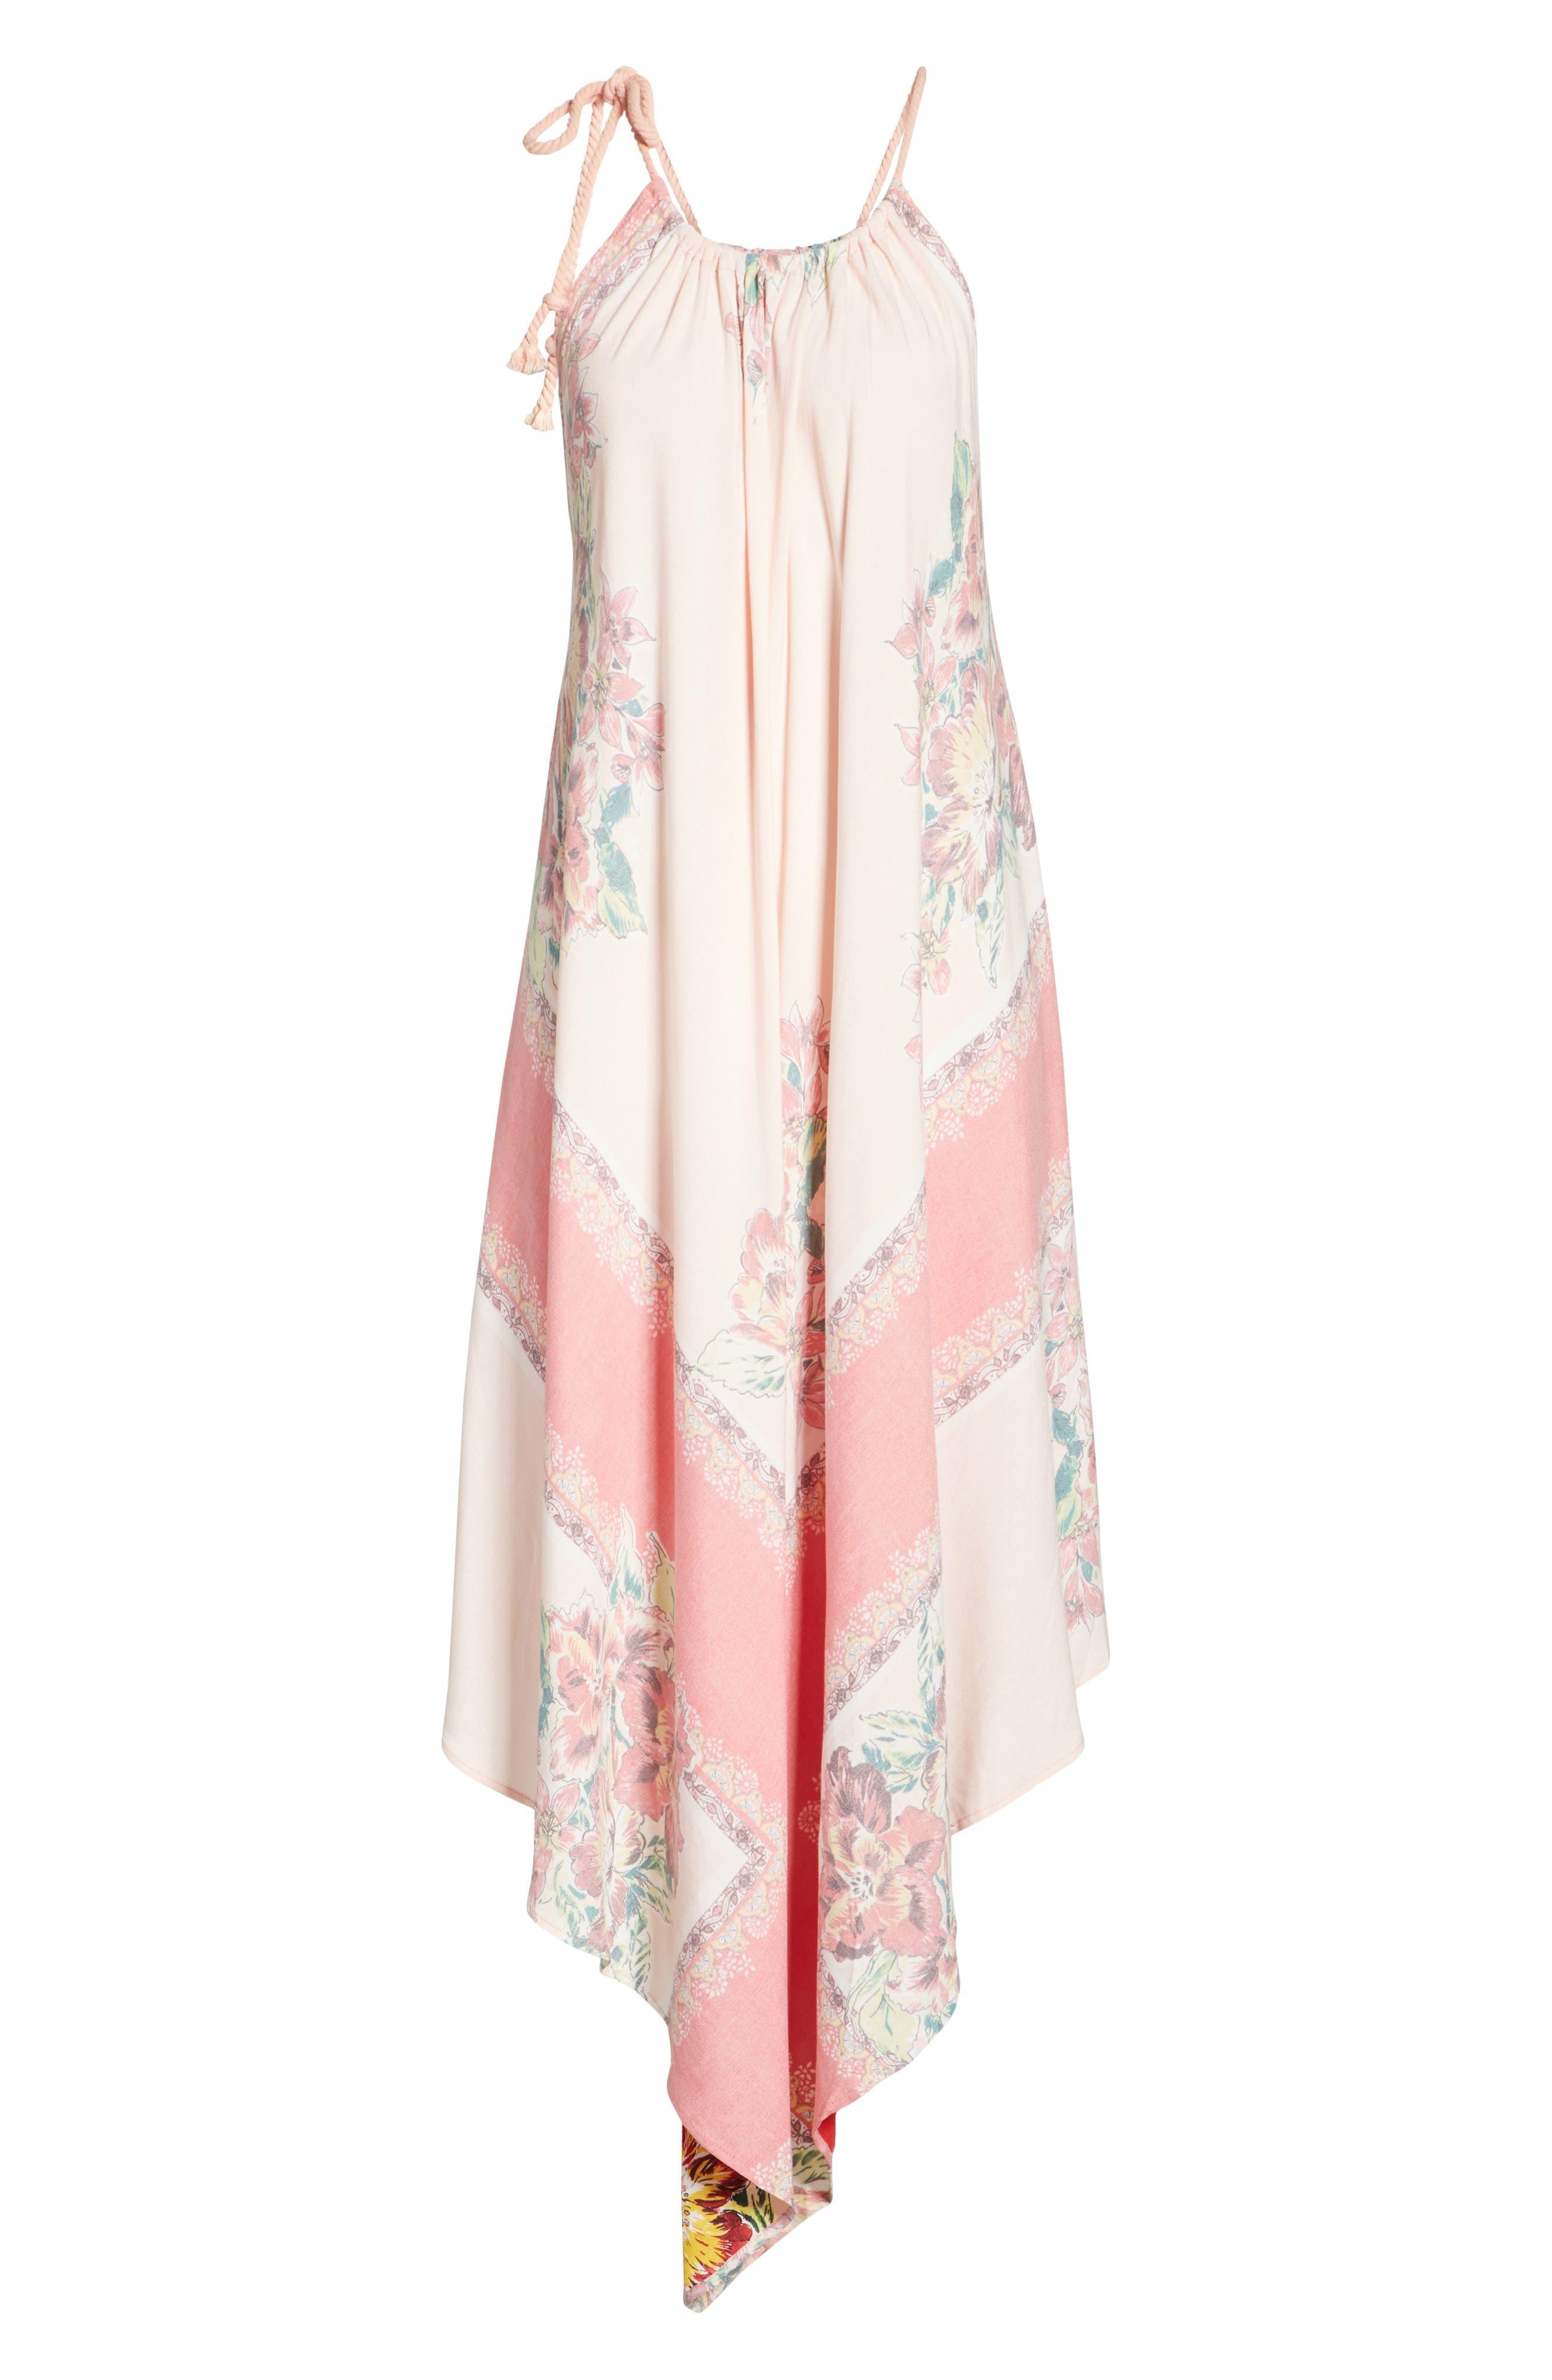 Mind's Eye Maxi Dress,                             Alternate thumbnail 6, color,                             Pink